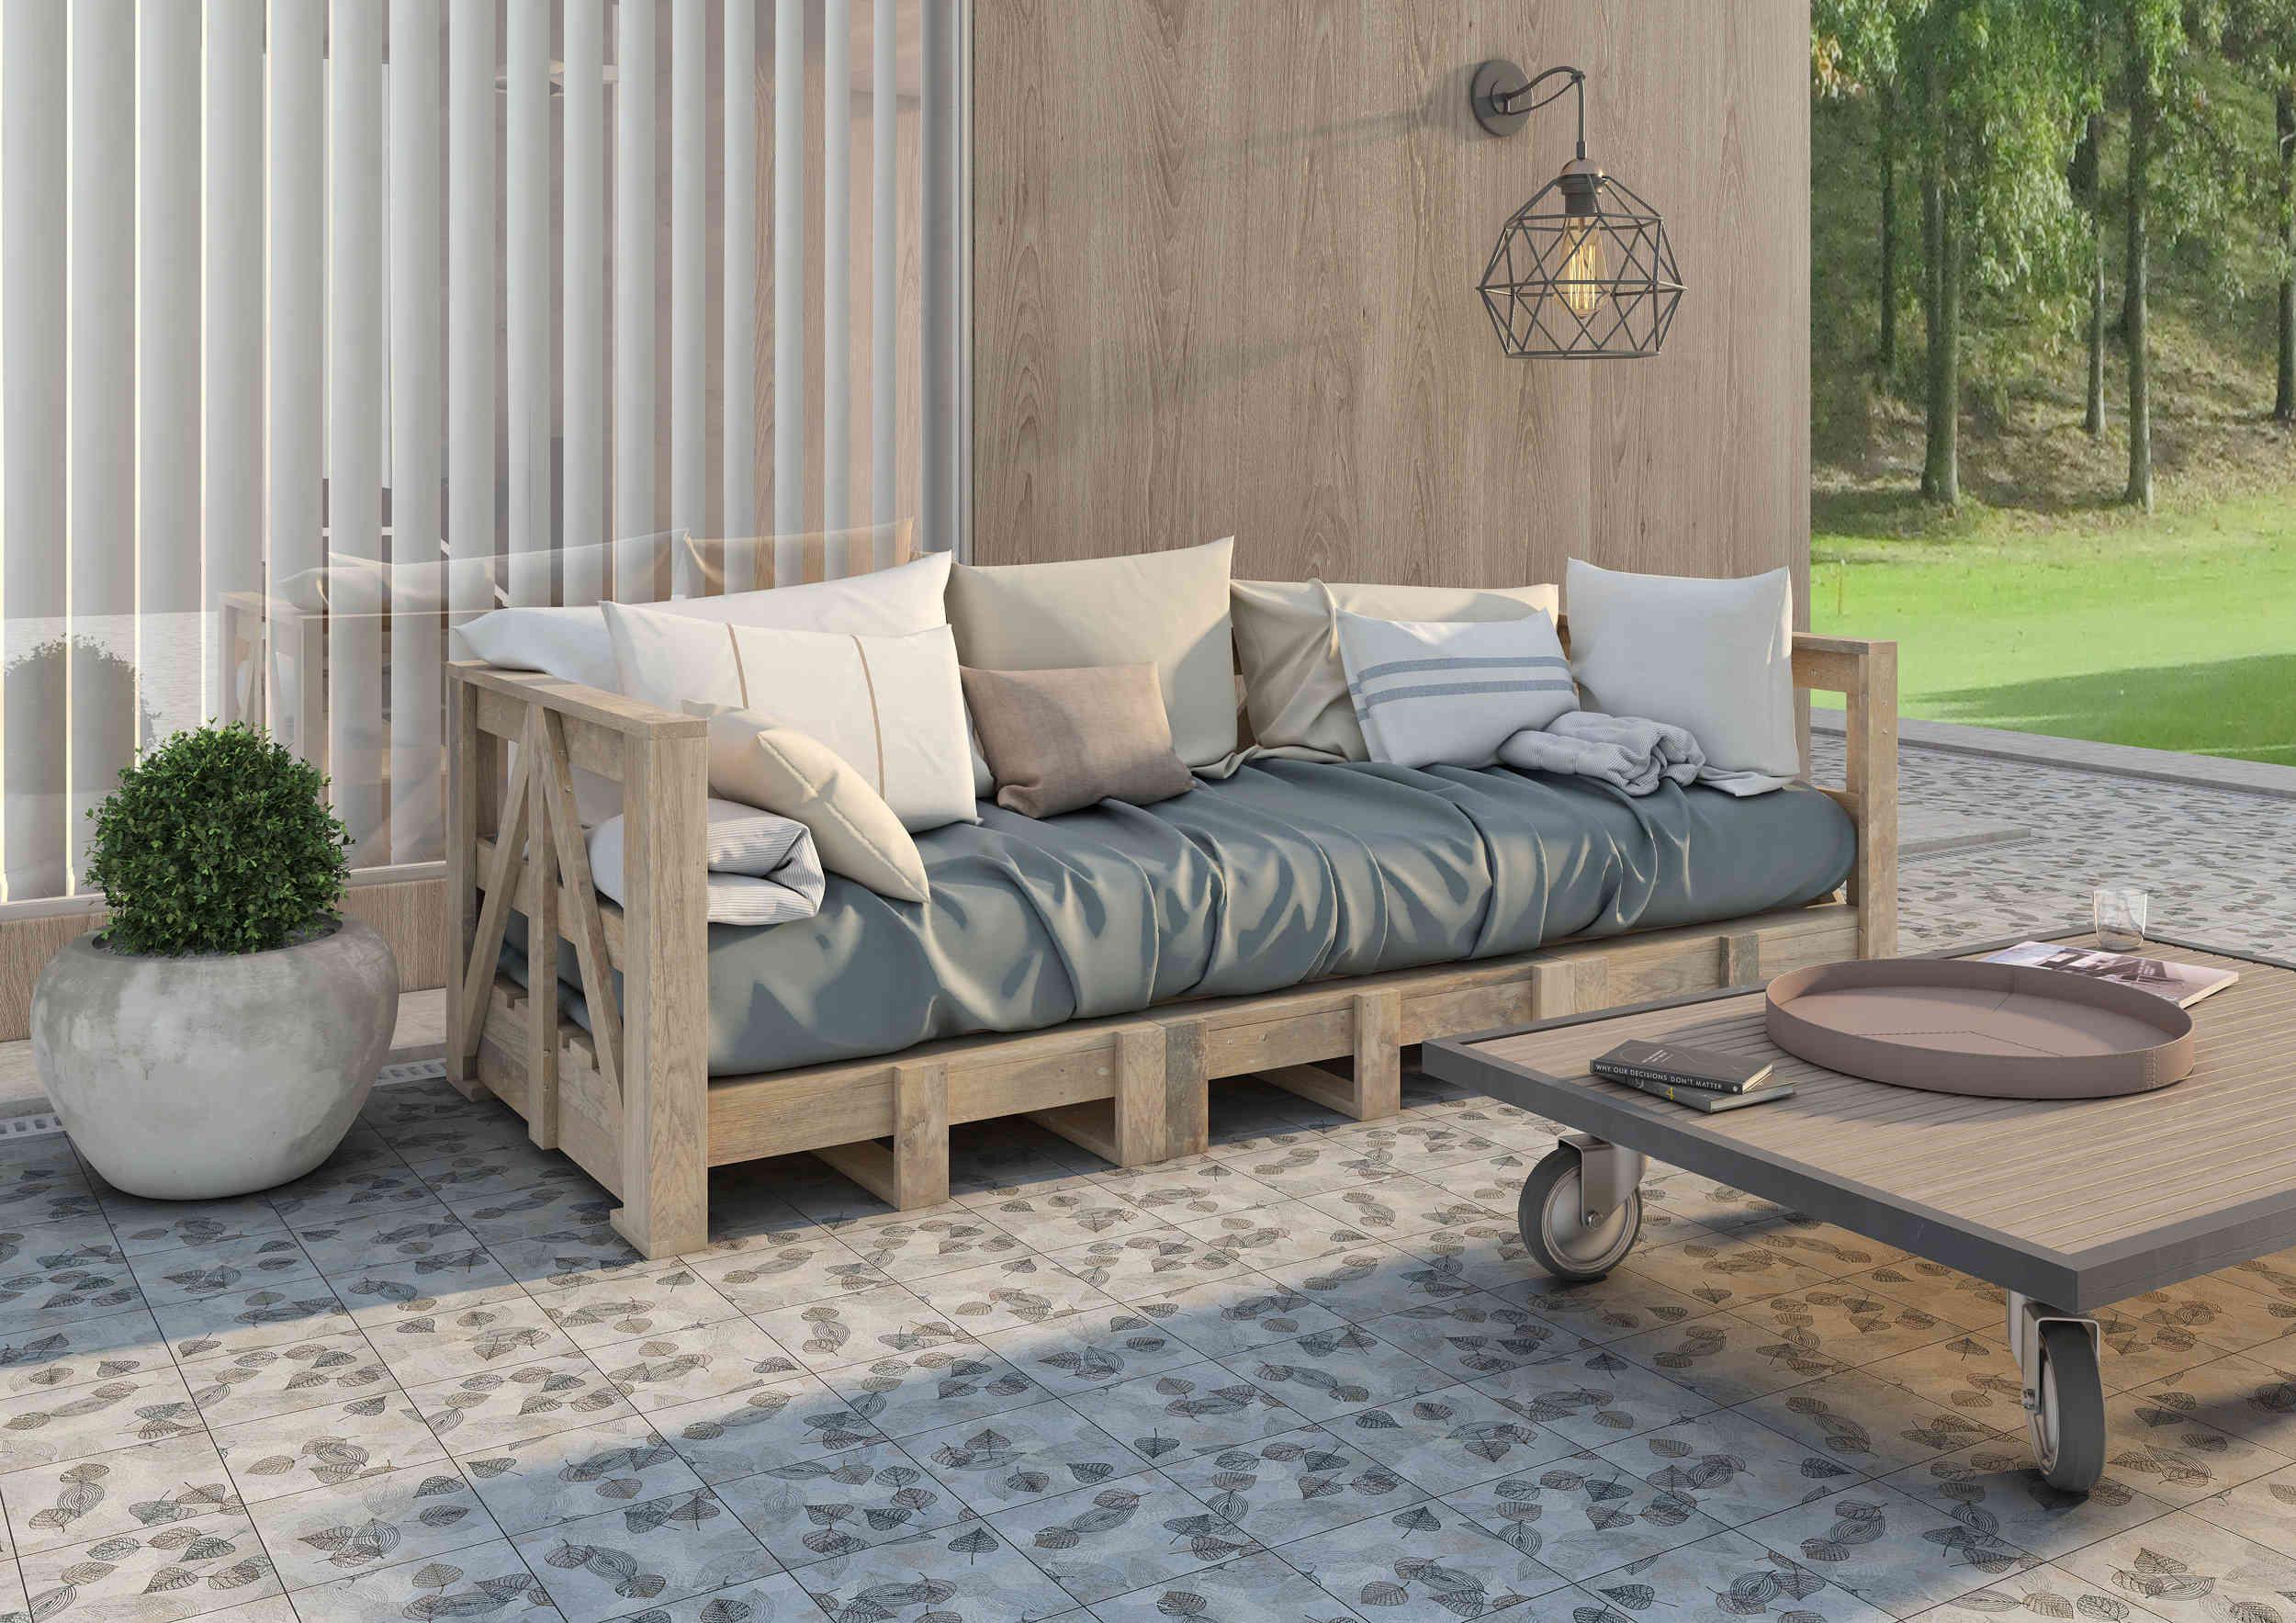 neocim-plus-terrasse-dlazba-venkovni-20x20-dekory-listky